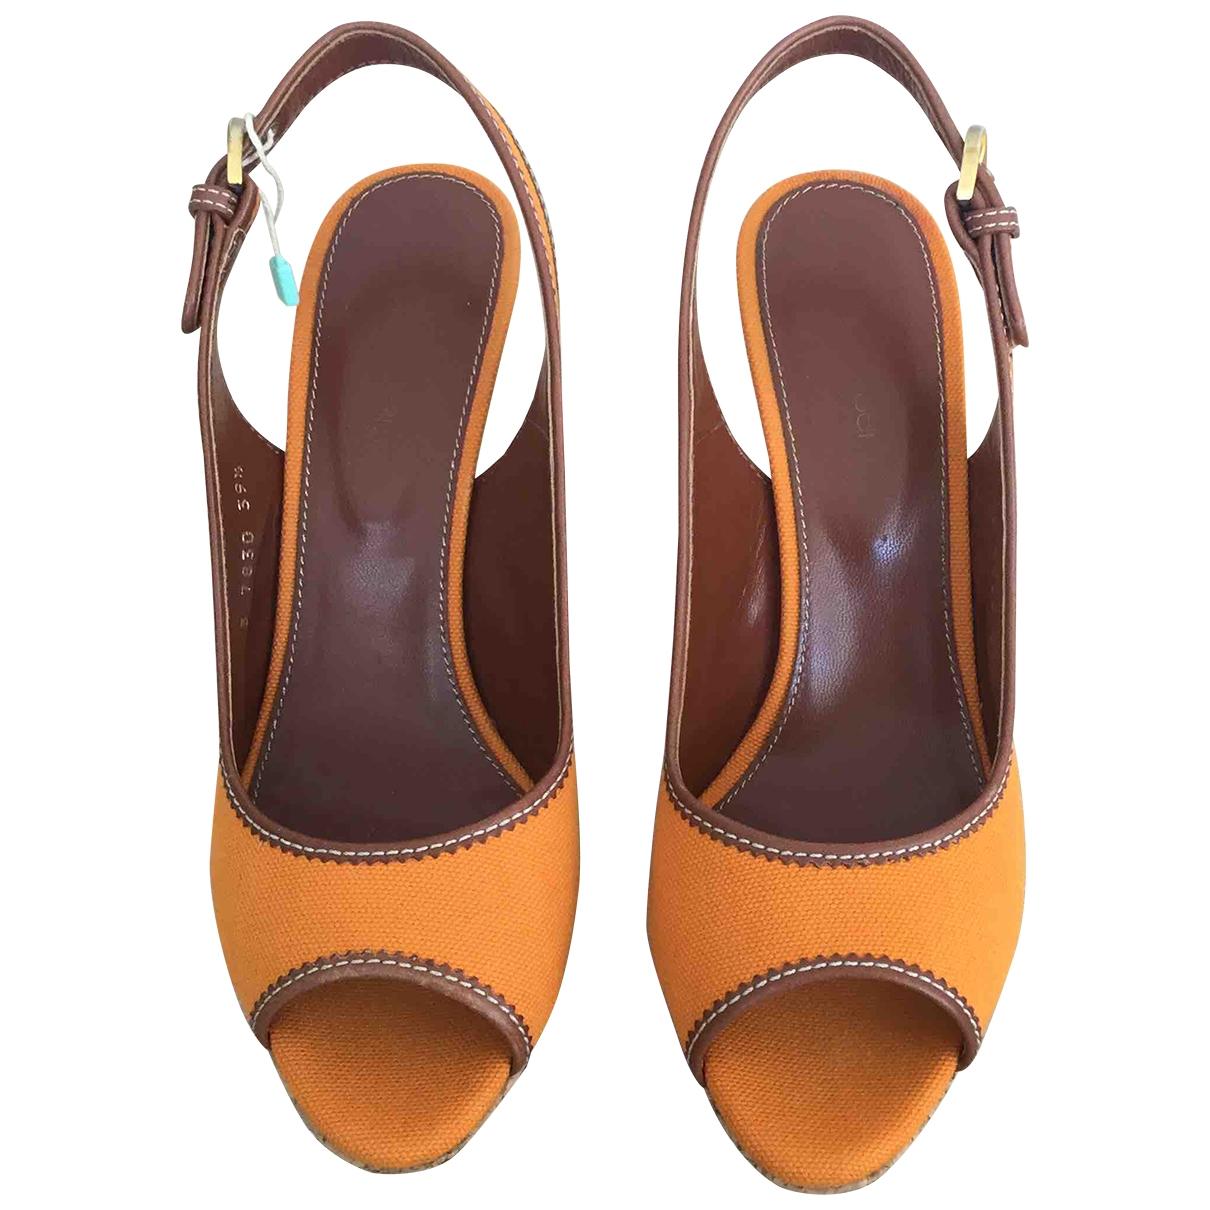 Sergio Rossi - Sandales   pour femme en toile - orange